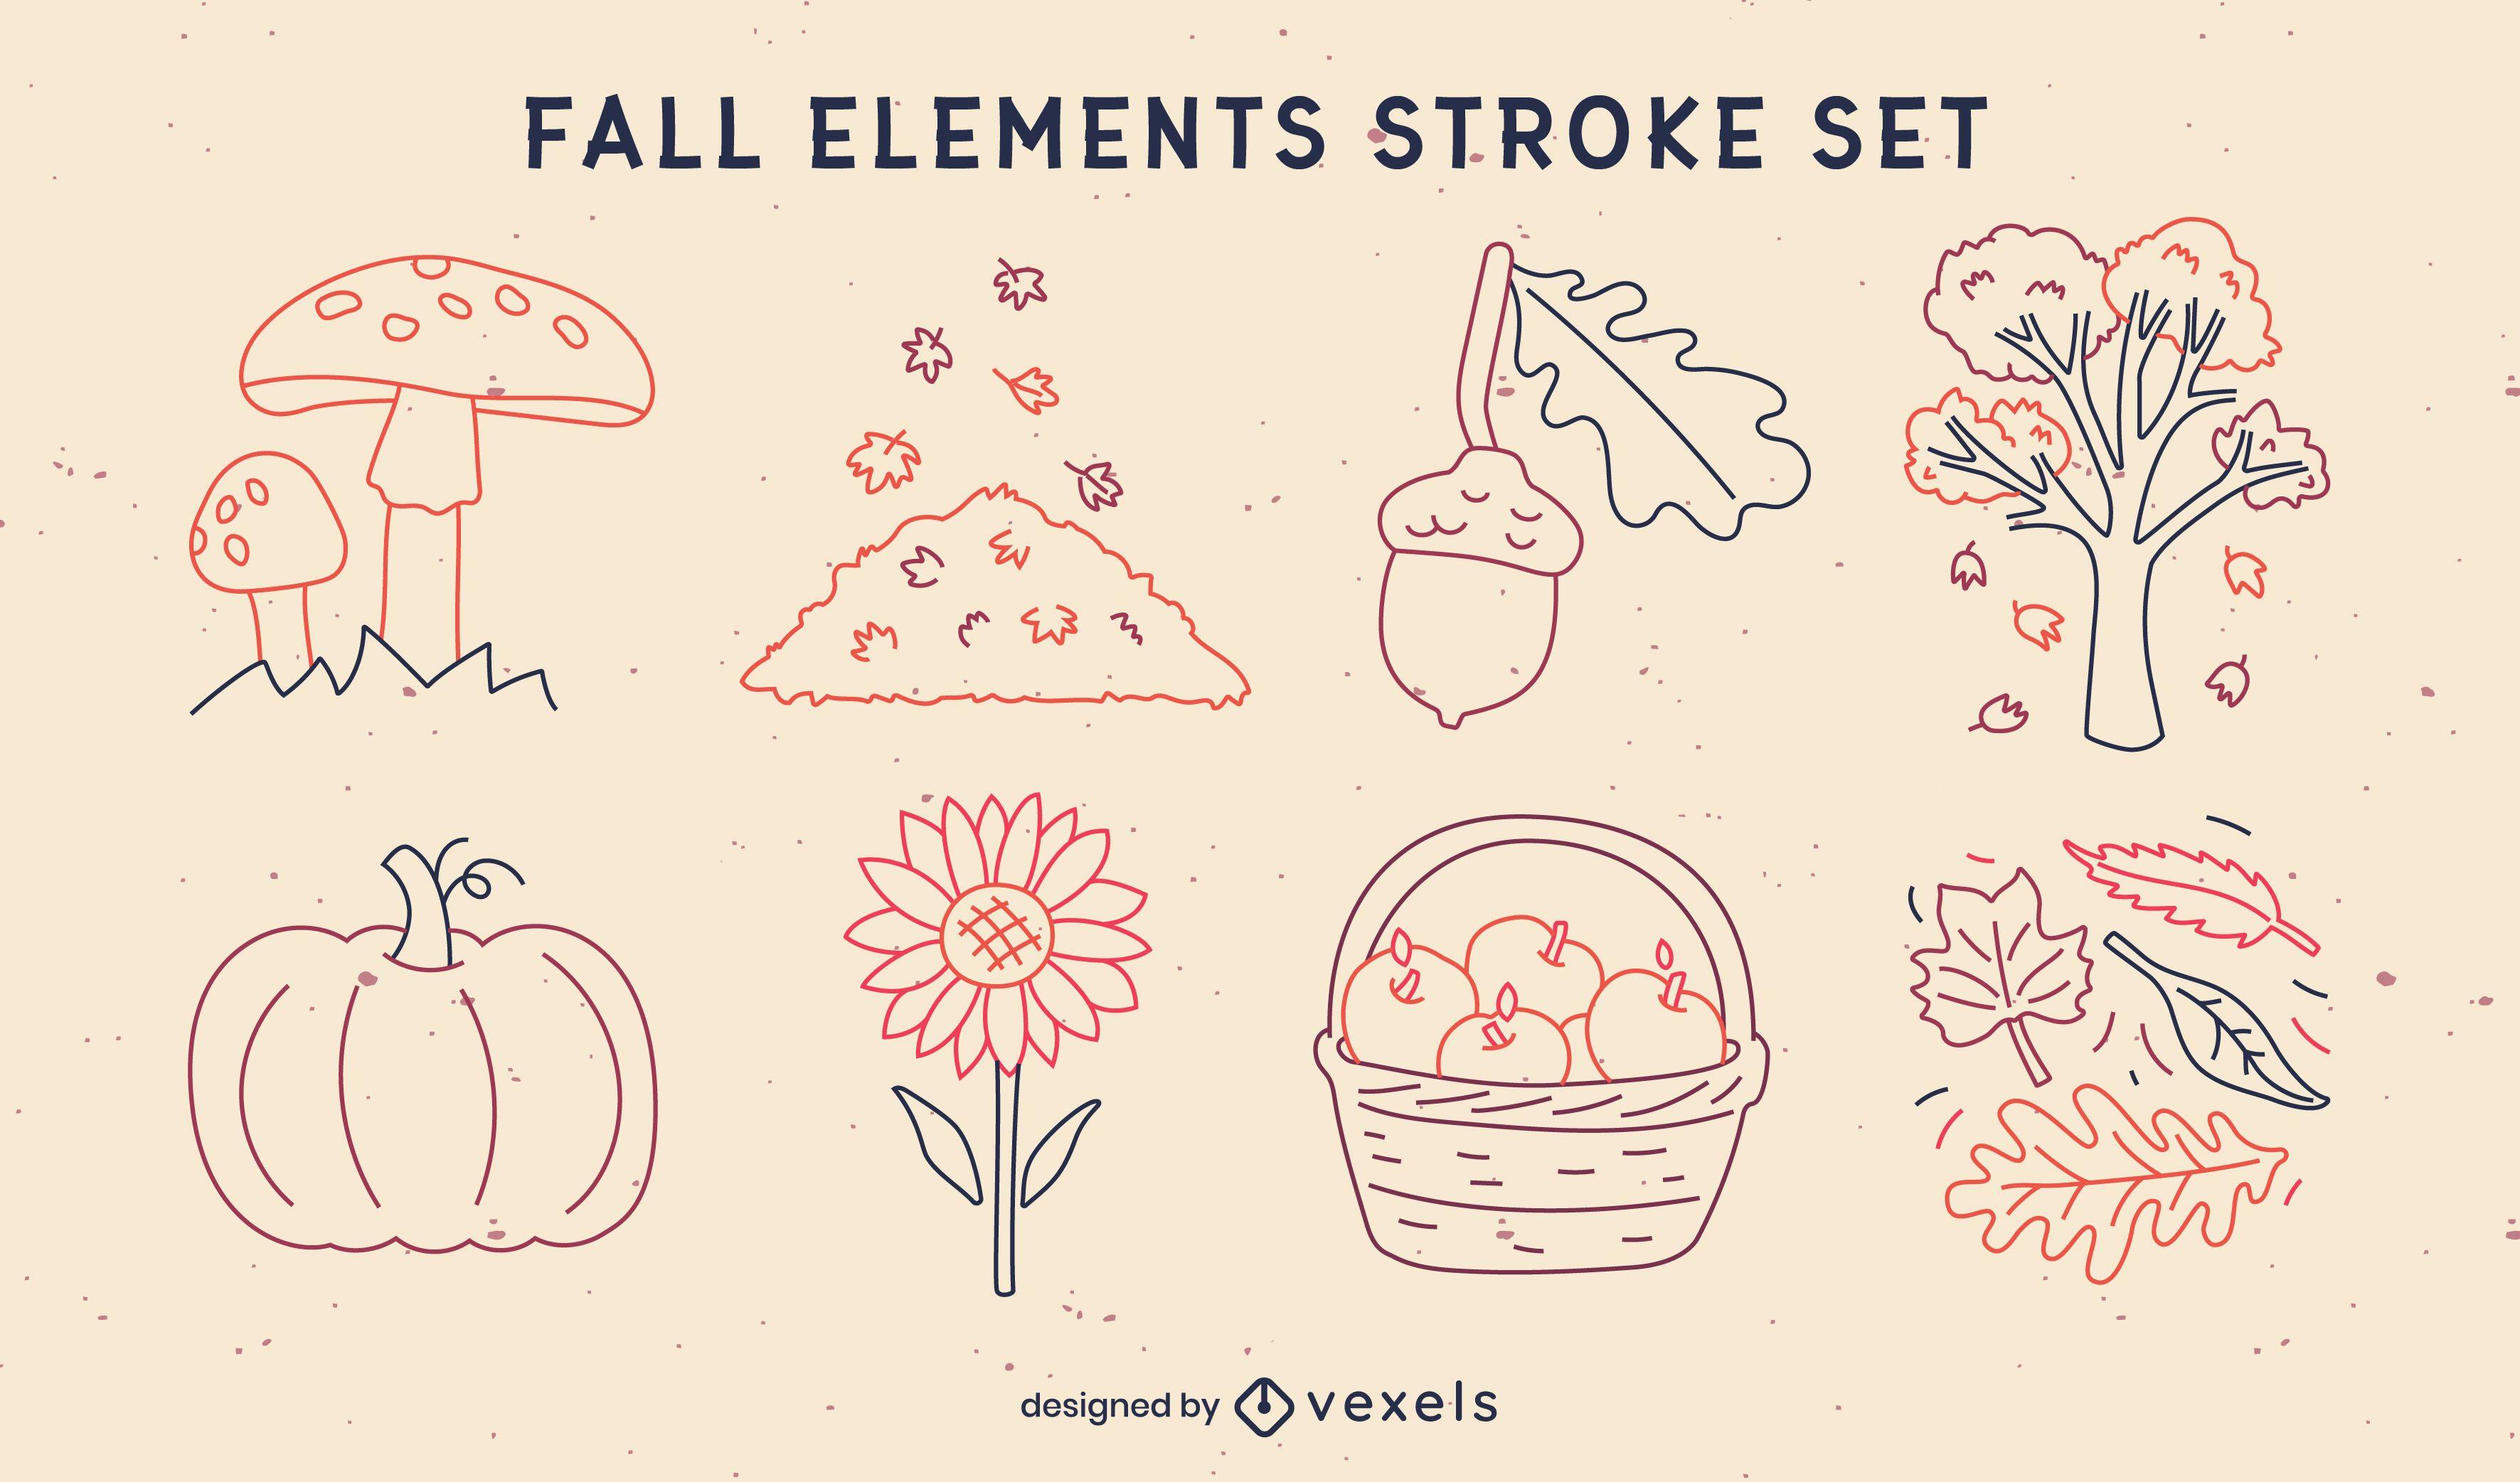 Autumn season elements nature stroke set